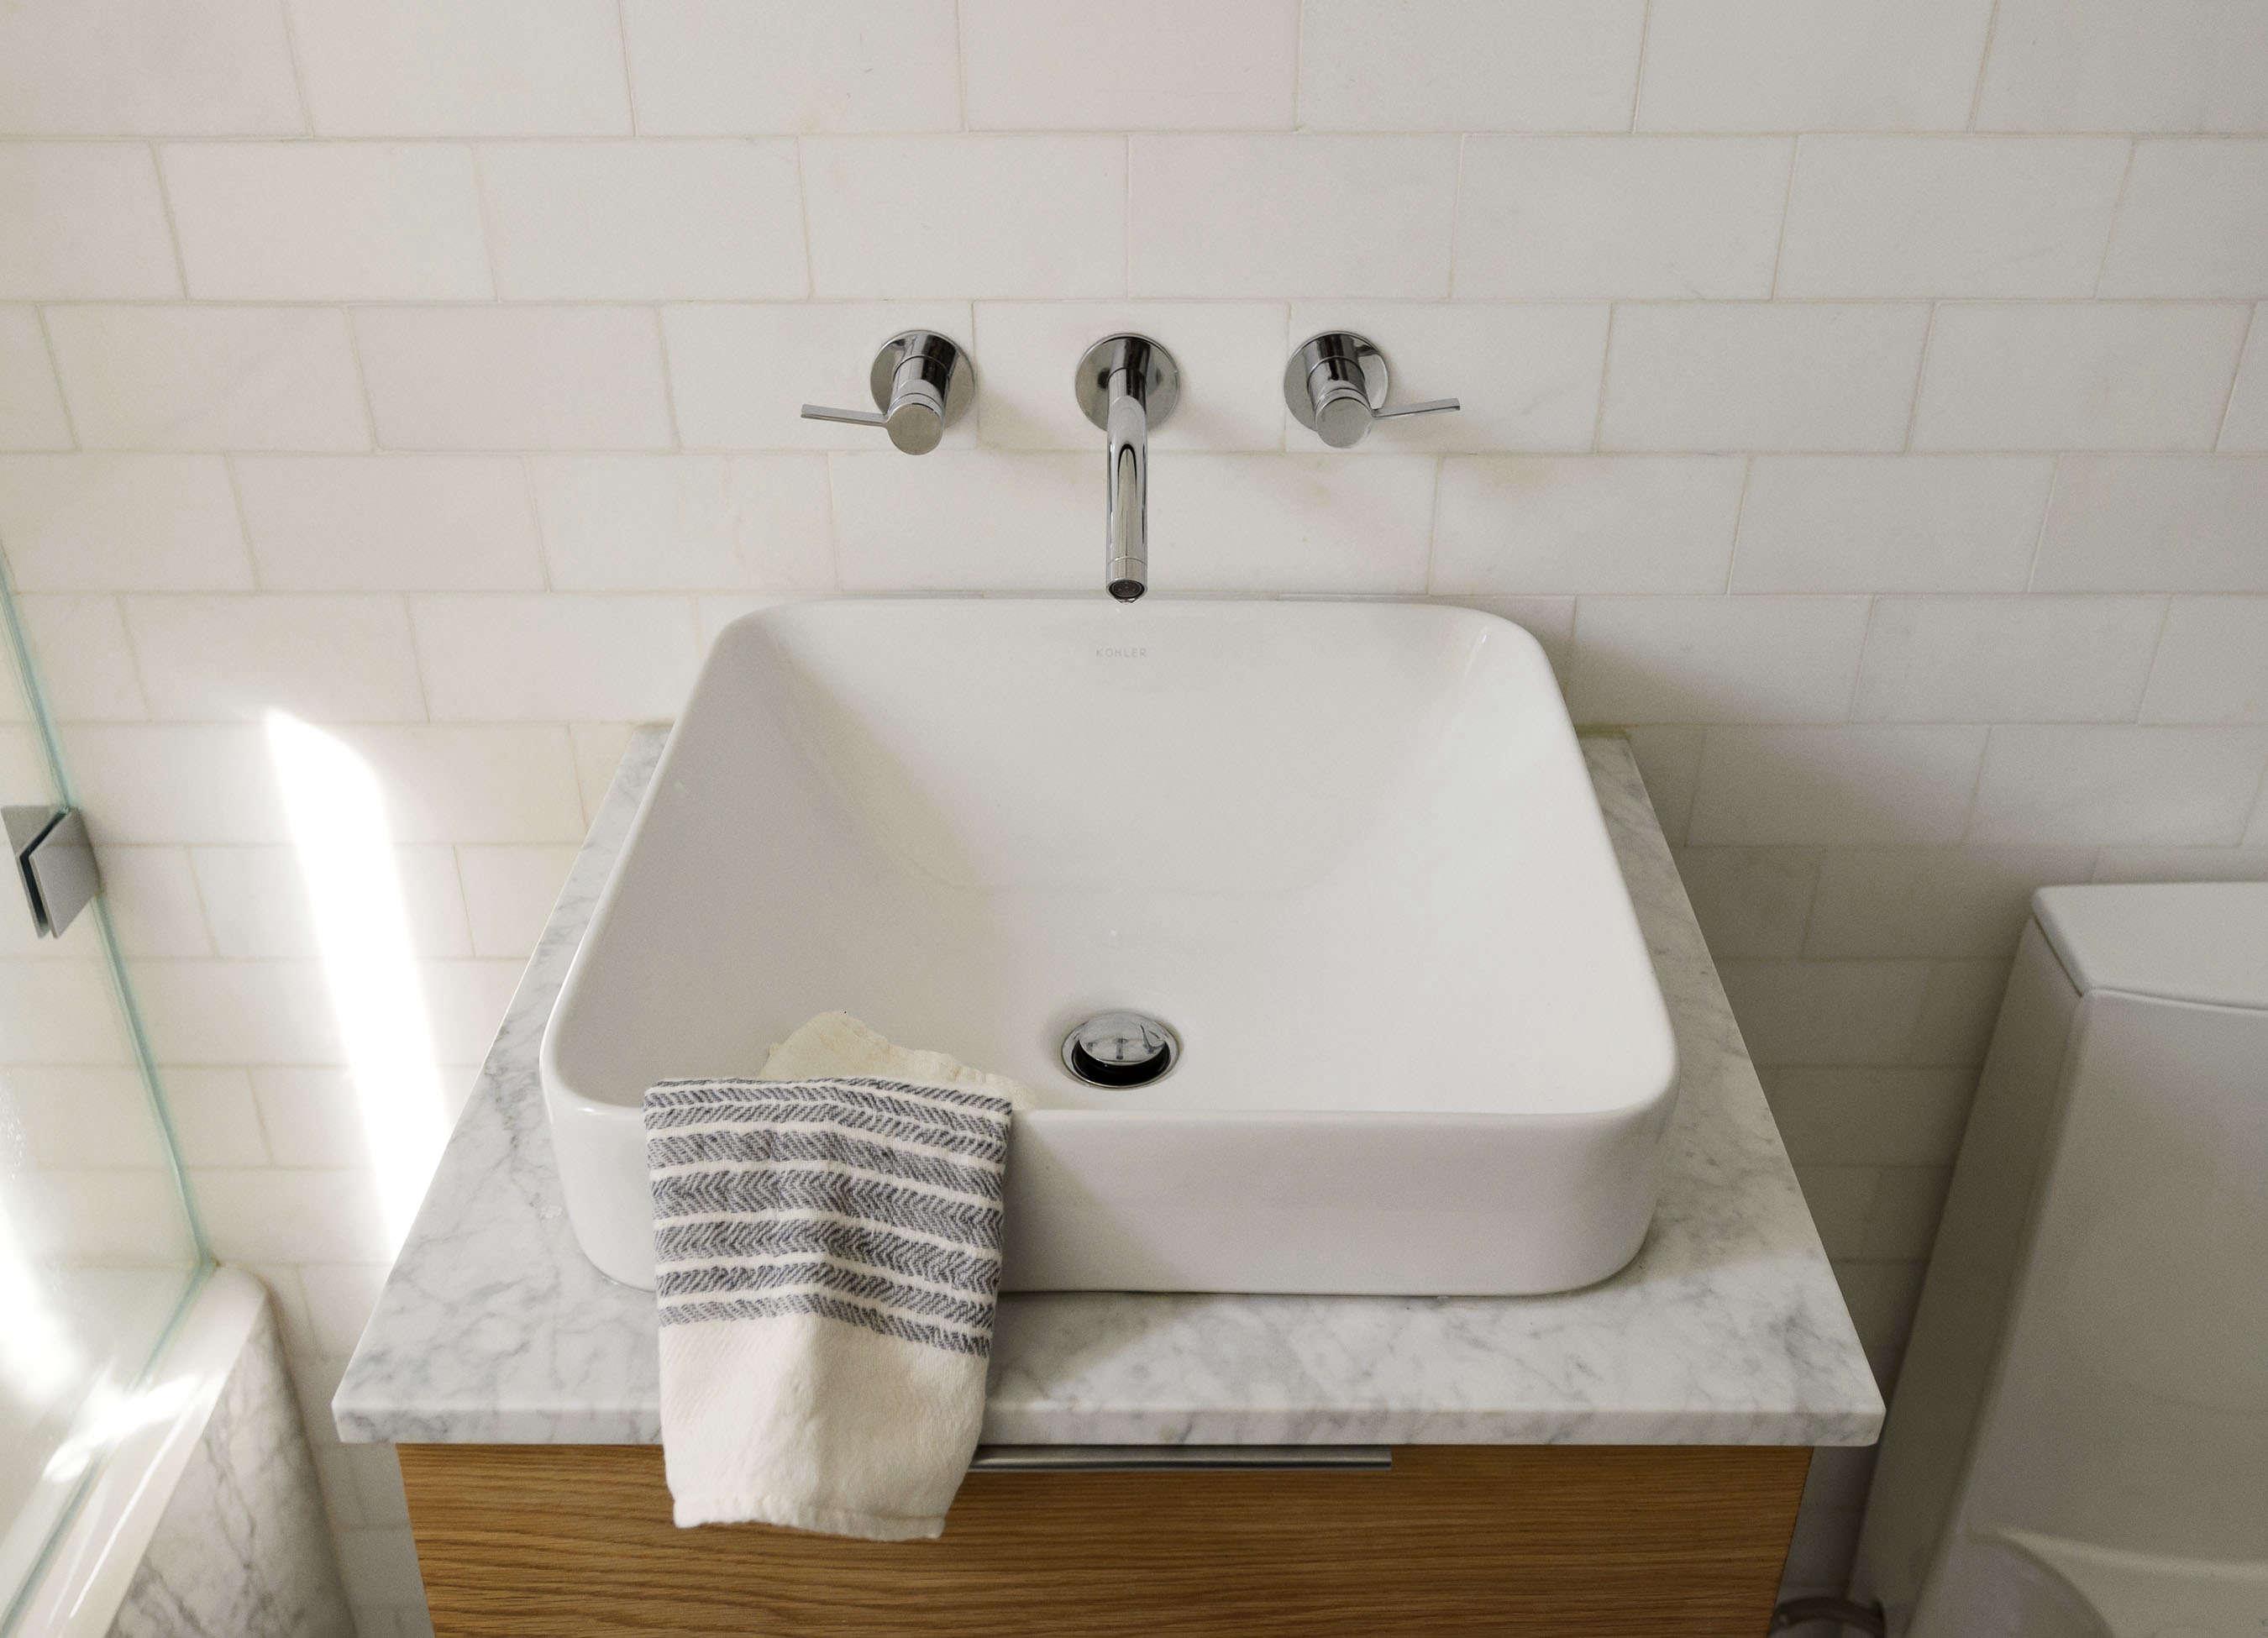 Square bathroom sink in Jacqueline-Schmidt and David Friedlander's 675-square-foot Brooklyn quarters, Matthew-Williams-photo | Remodelista